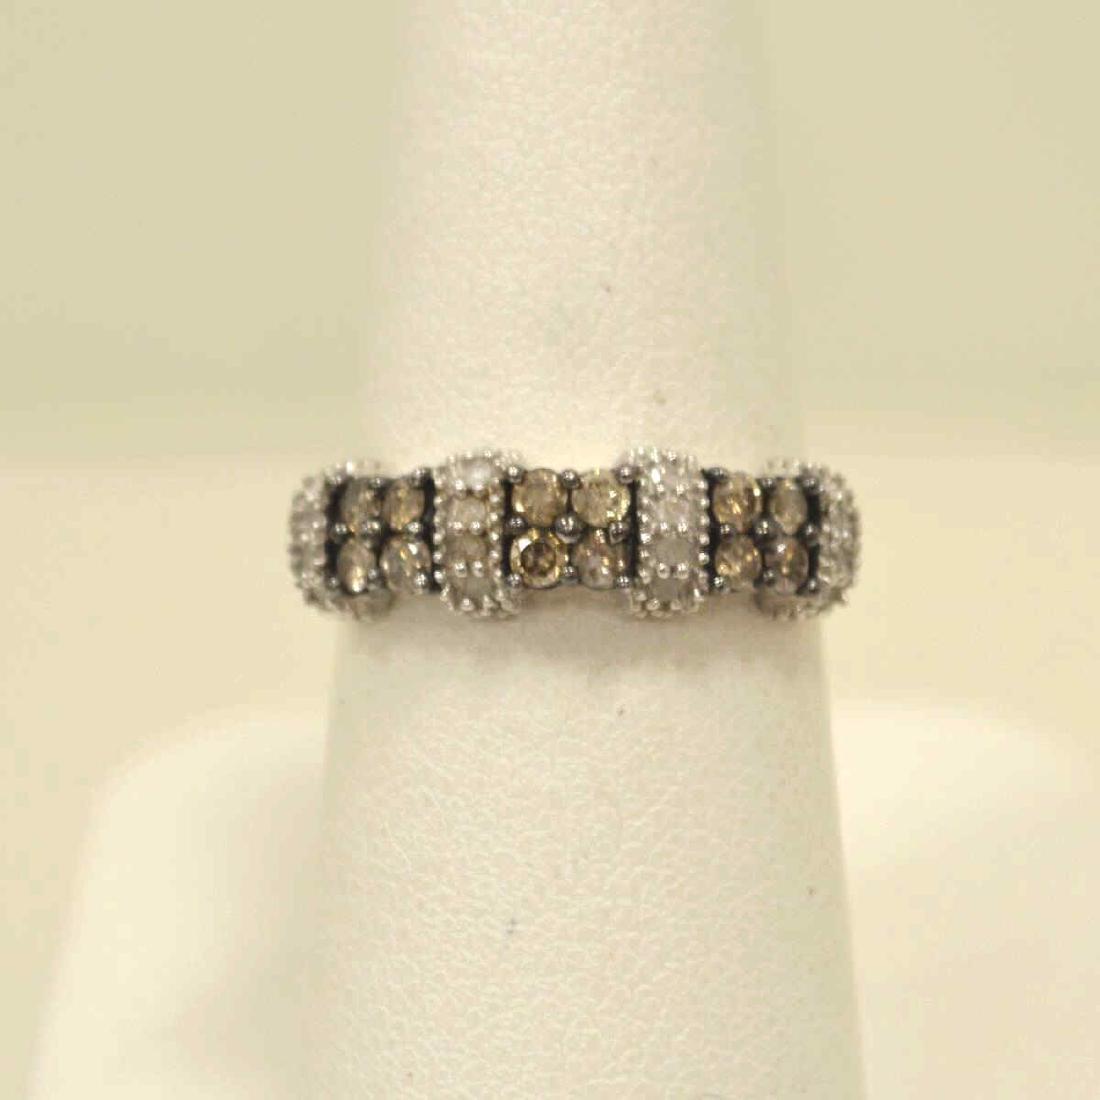 10kt white gold diamond fashion band